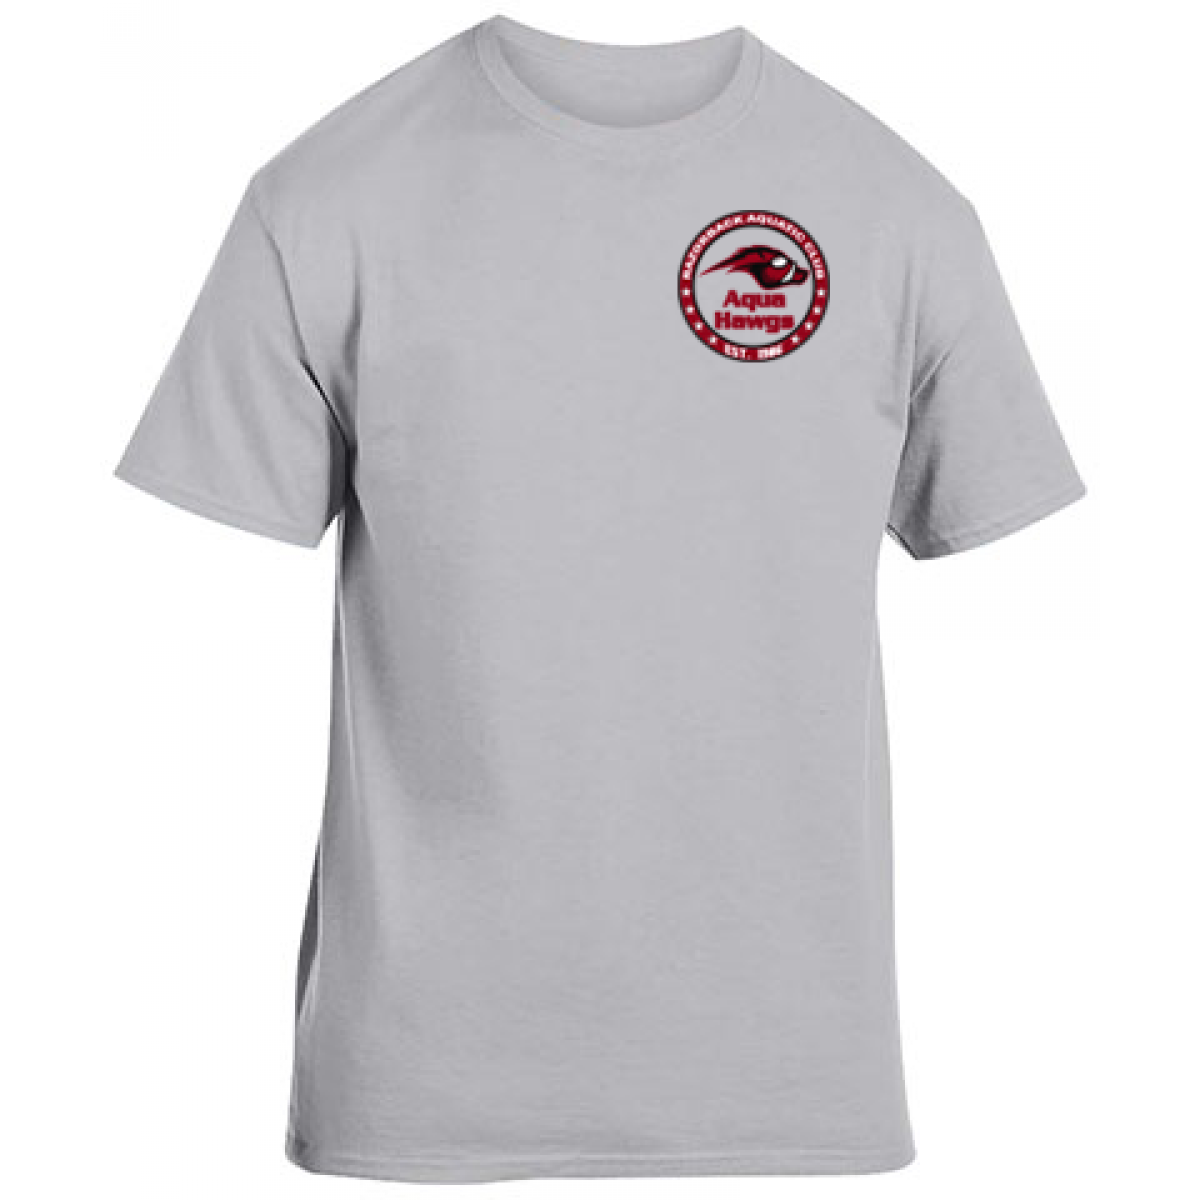 Gildan Cotton Short Sleeve T-Shirt Gray